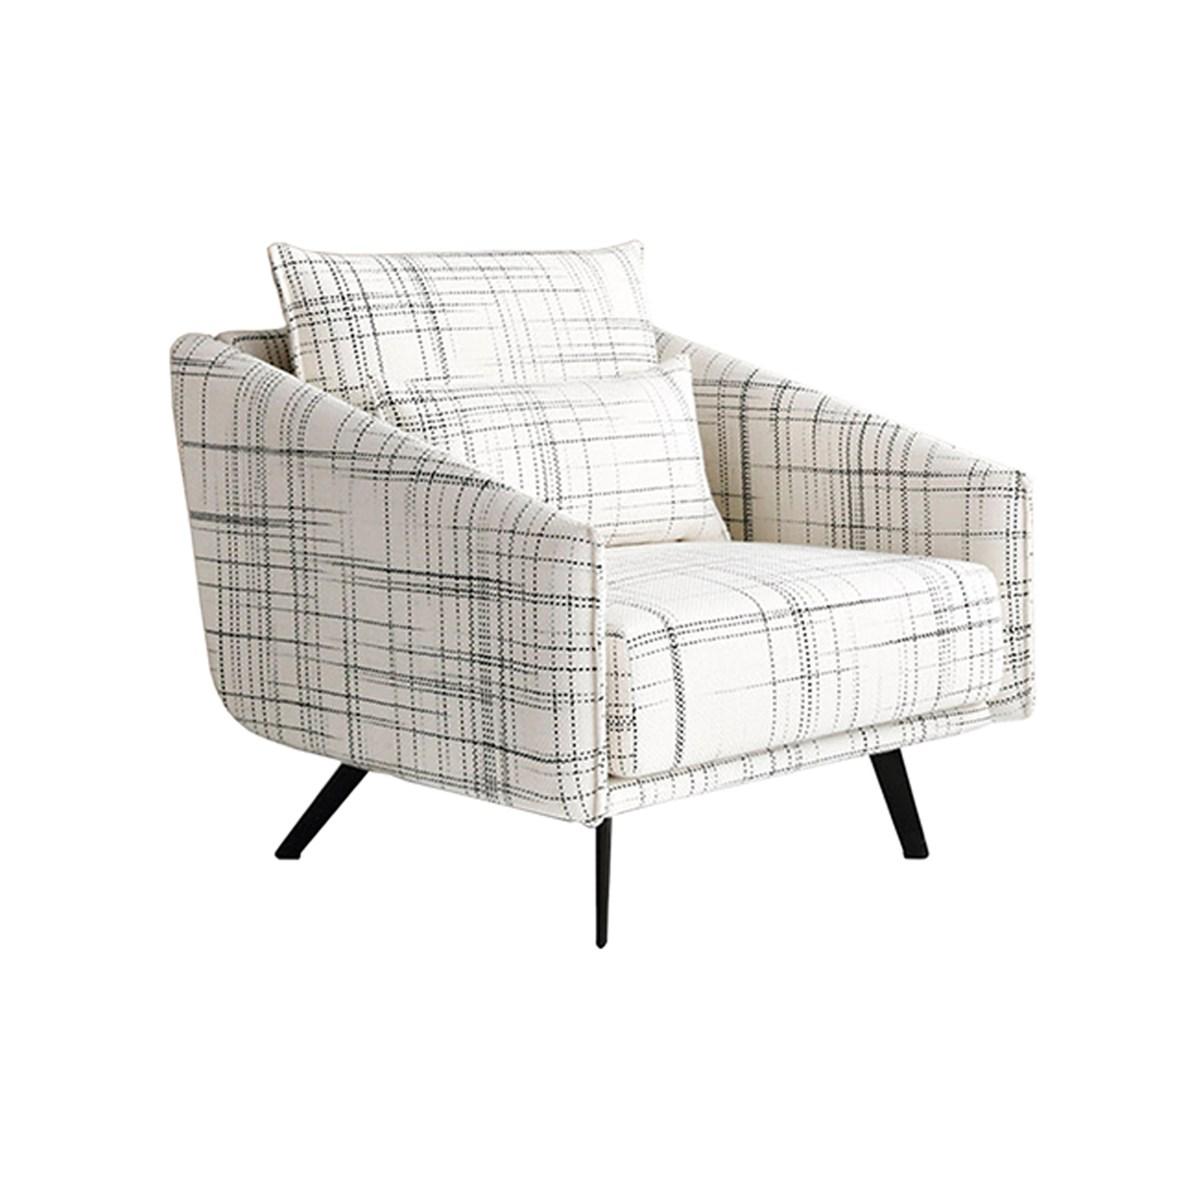 Stua-Jon-Gasca-Costura-Armchair-Matisse-2